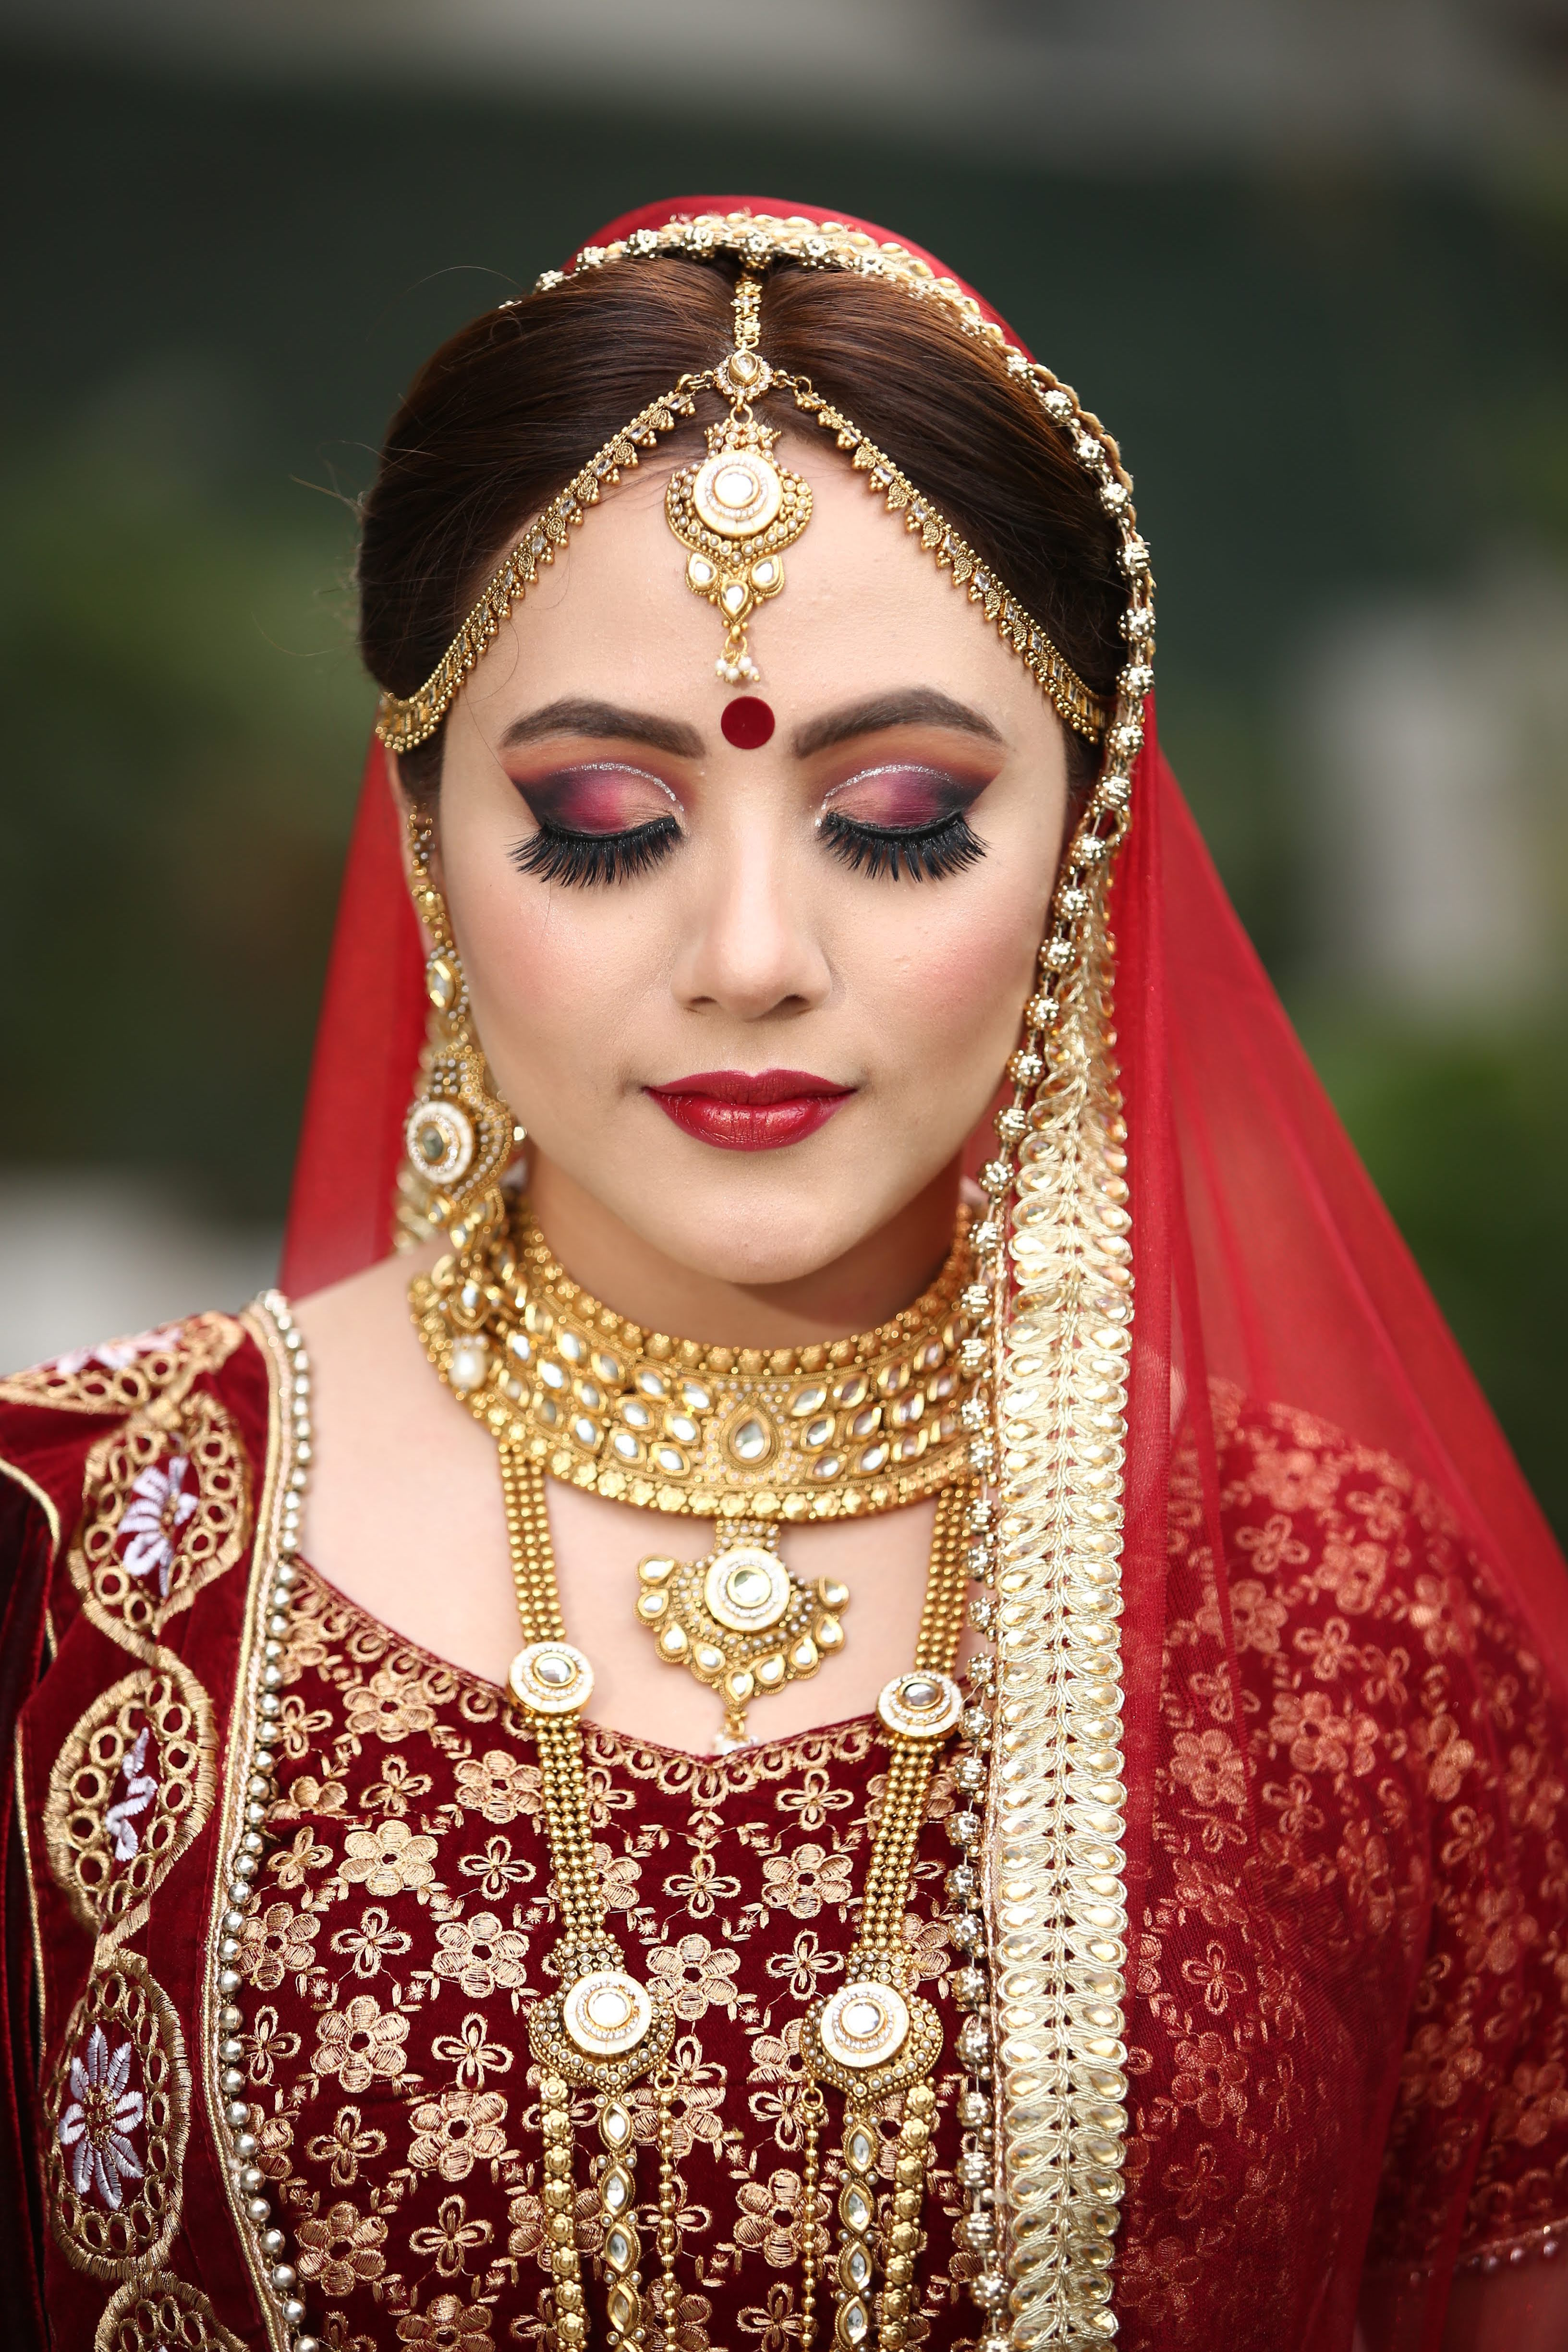 parul-makeup-artist-delhi-ncr